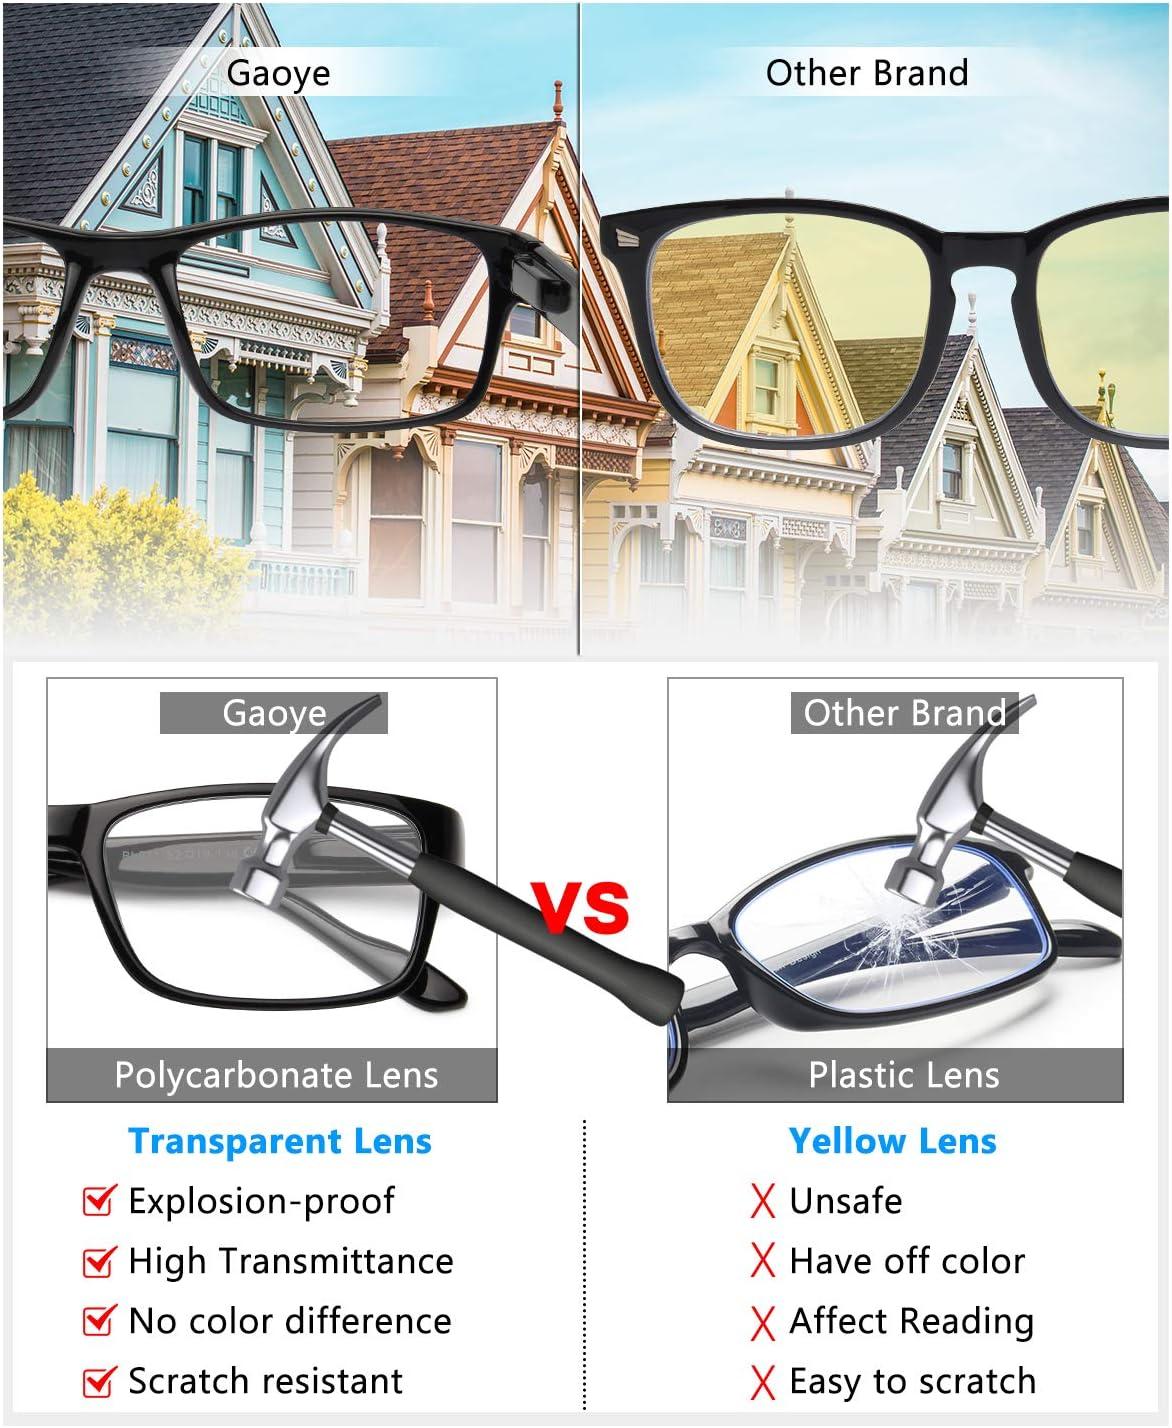 GAOYE 5-Pack Reading Glasses Blue Light Blocking with Spring Hinge,Readers for Women Men Anti Glare Filter Lightweight Eyeglasses (5-Pack, 1.5): Health & Personal Care